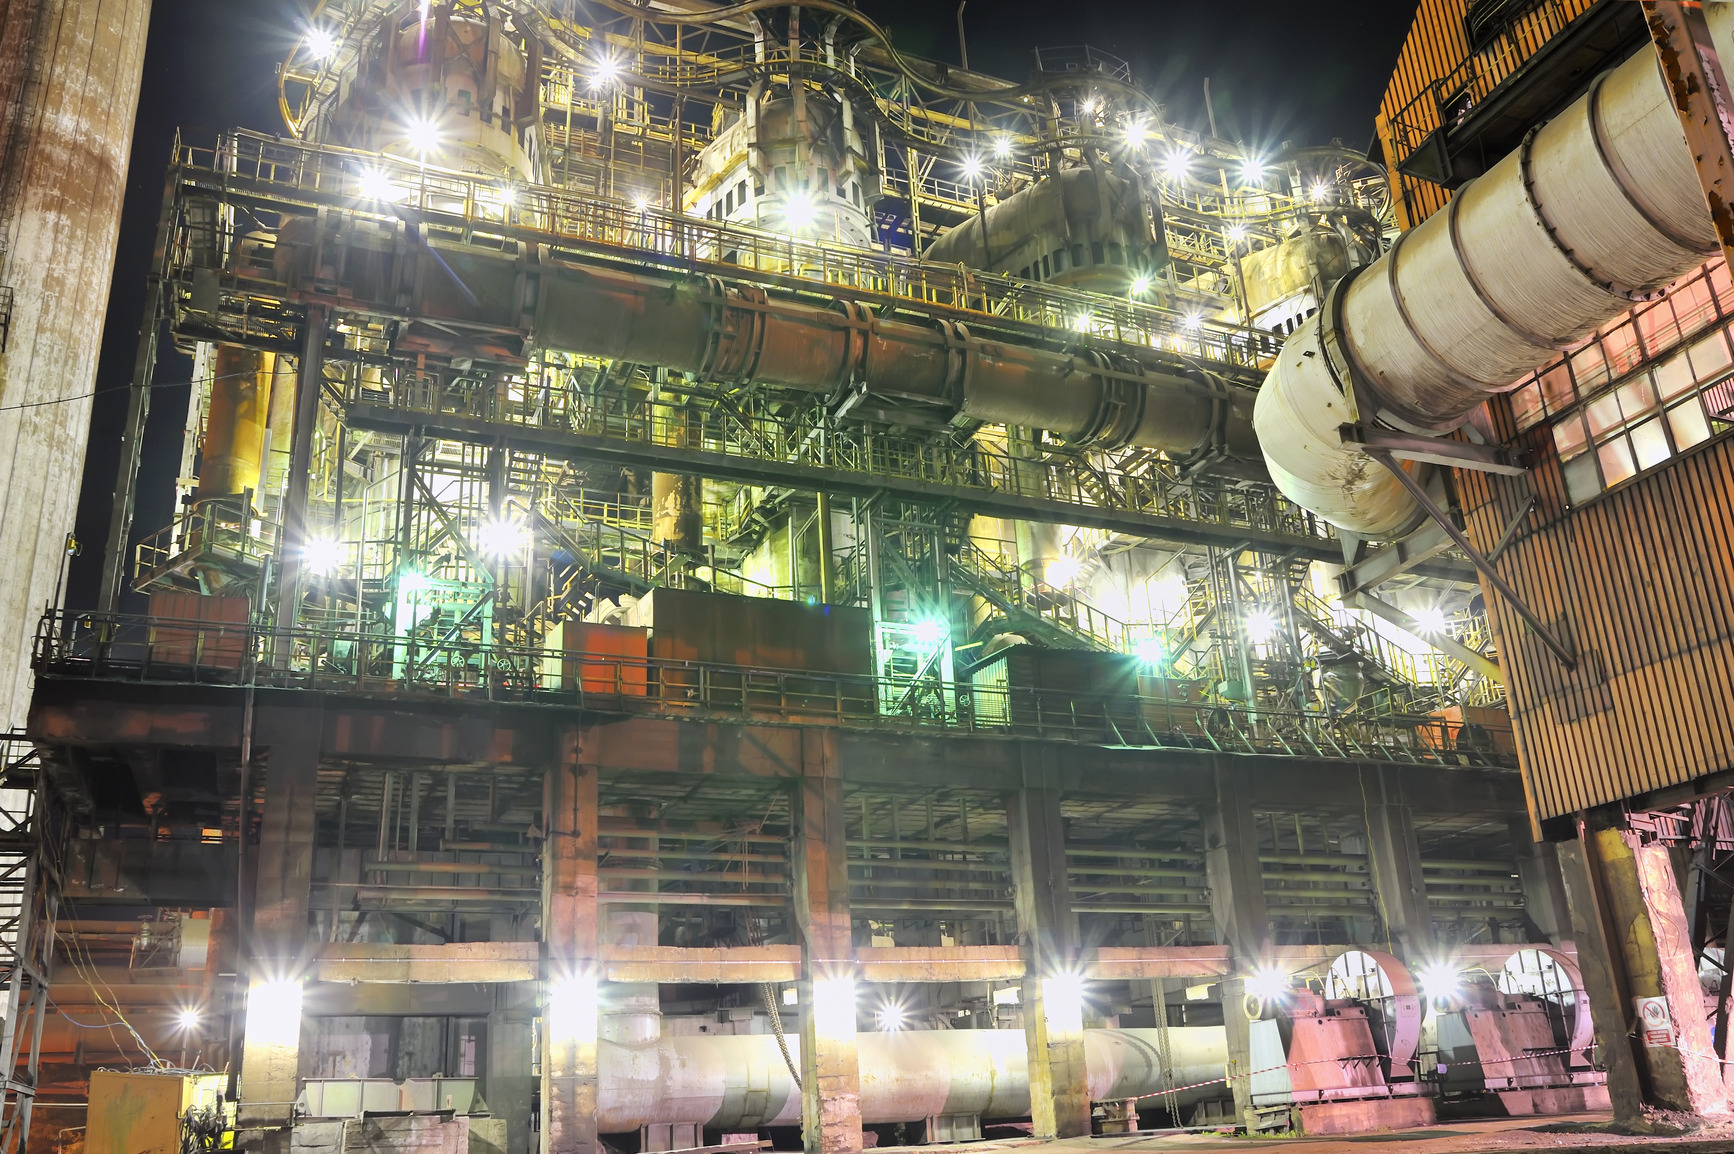 STEEL & METALS    Gerdau Ameristeel, Calgon Carbon, Charter Steel, Magic Metals Inc., Steel Dynamics Inc.